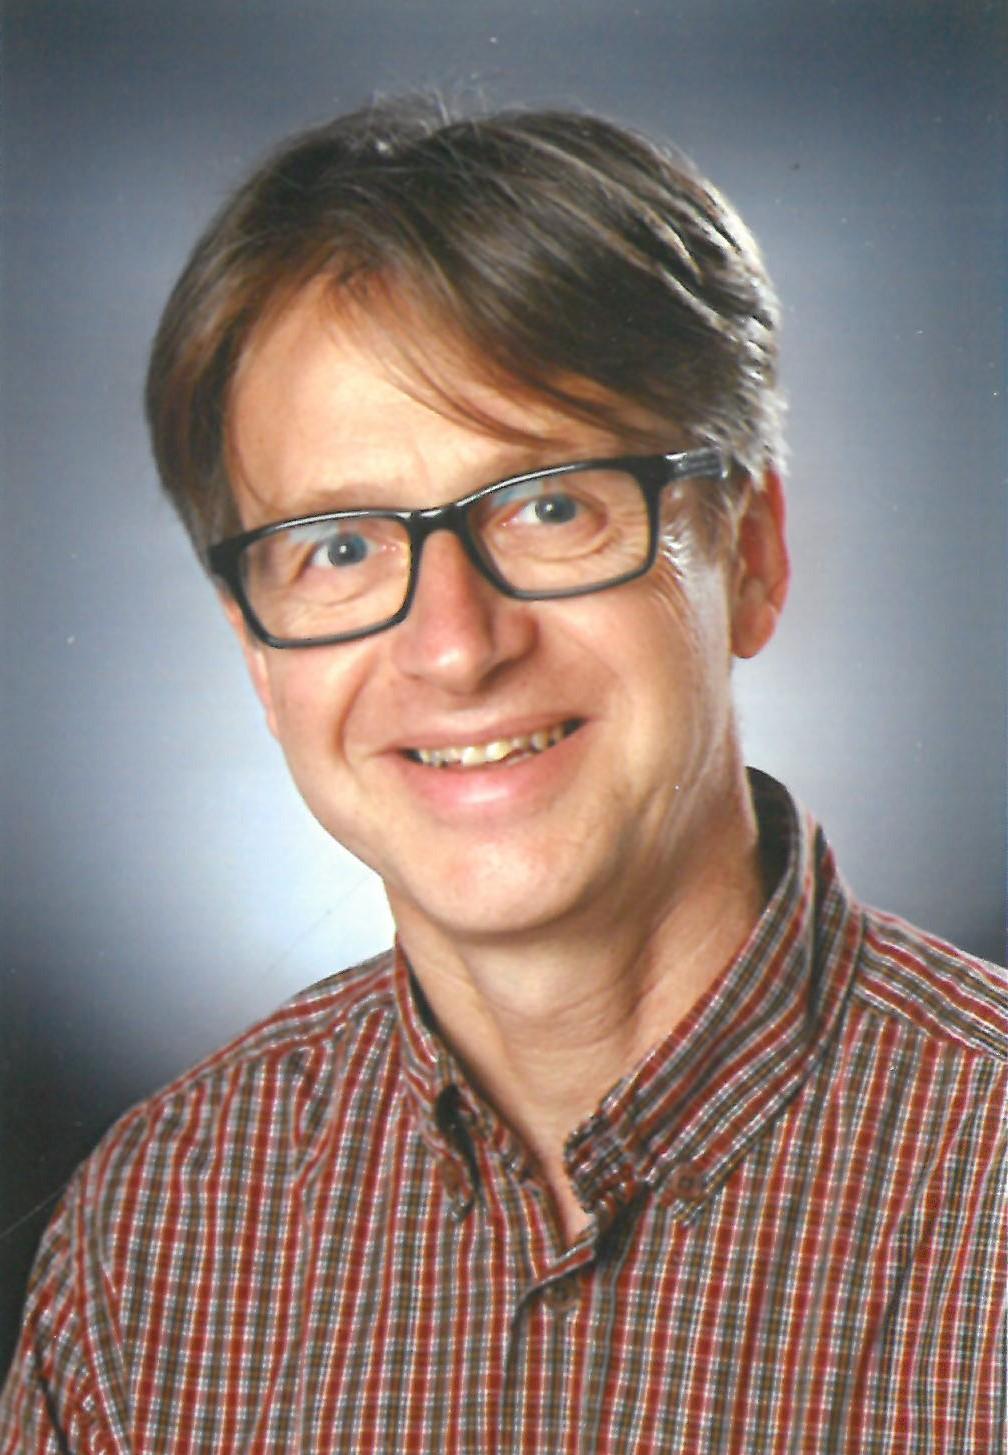 Matthias Henle